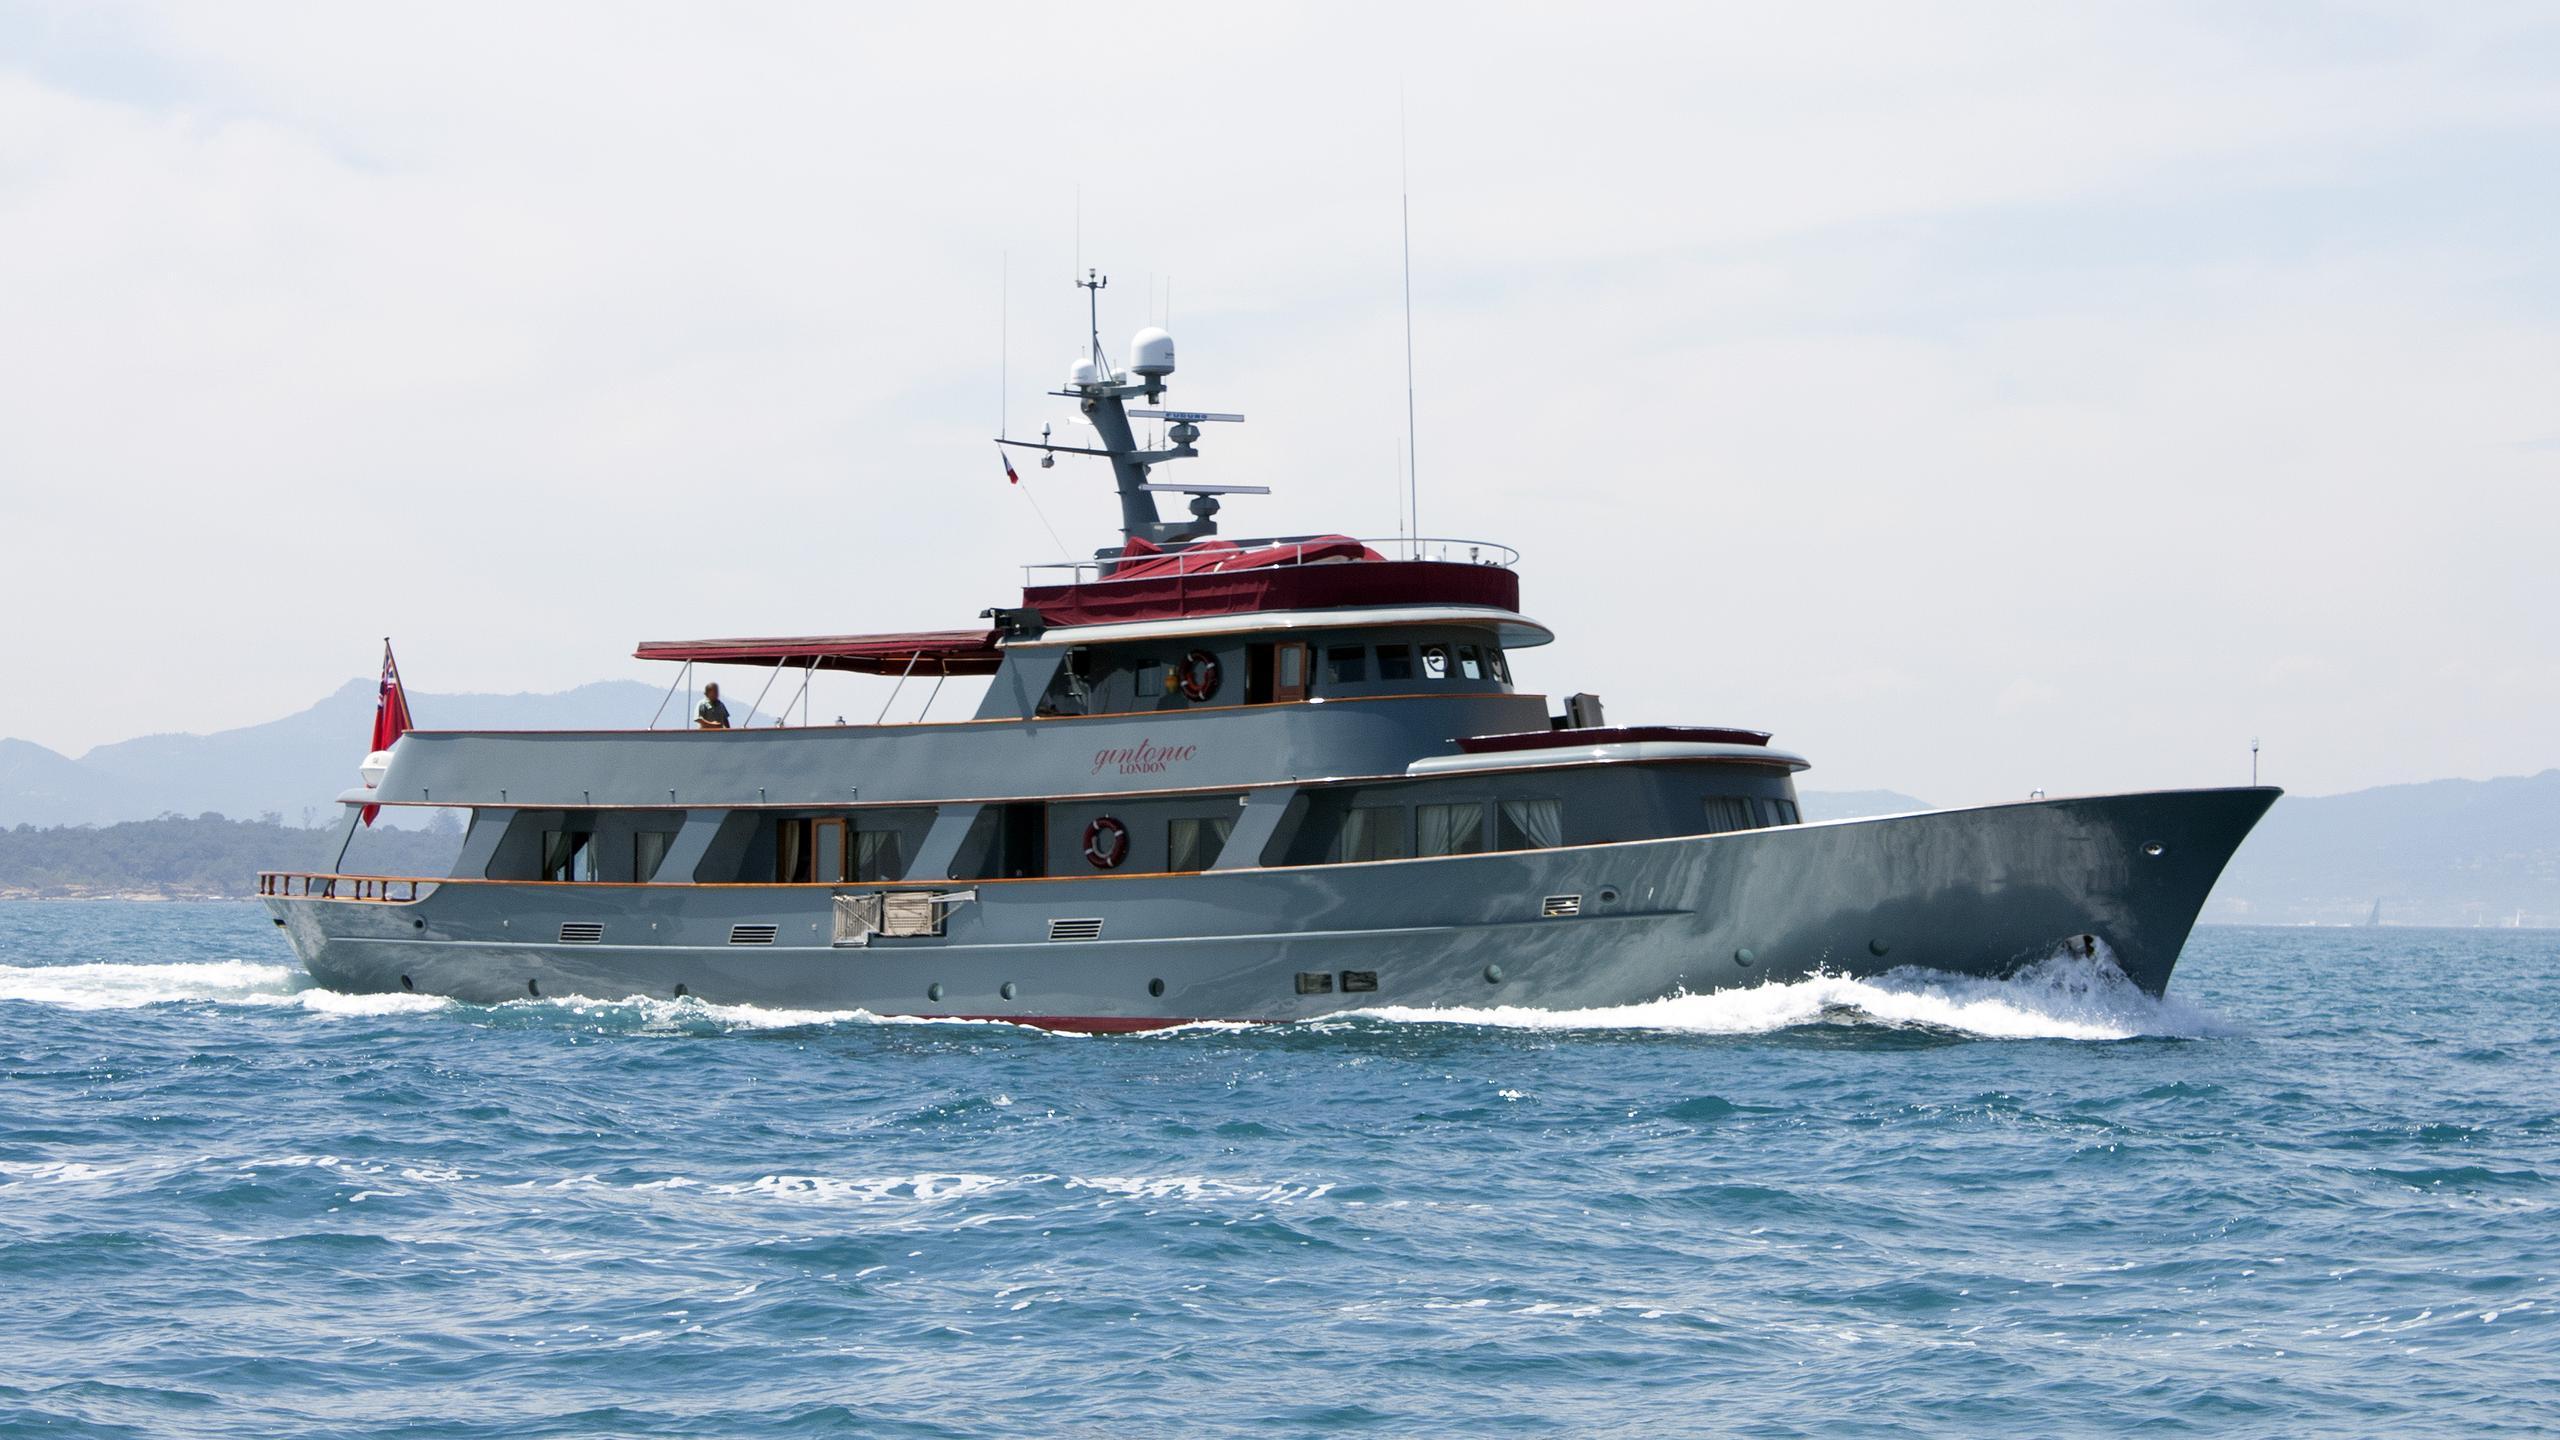 walanka-motor-yacht-hall-russell-1963-37m-cruising